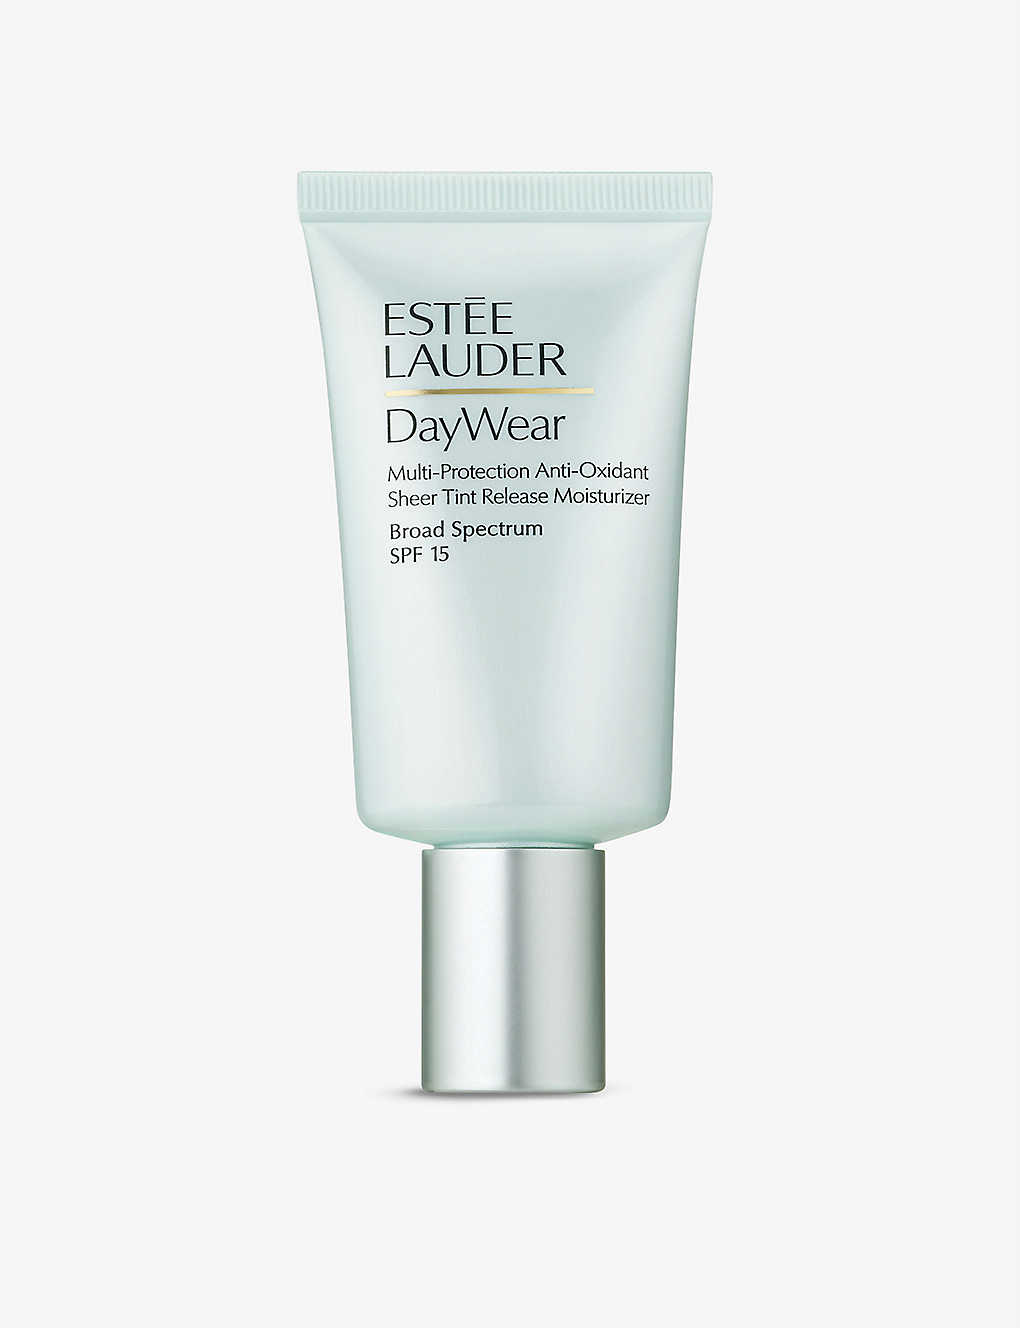 Estee Lauder Daywear Sheer Tint Release Advanced Multi Protection Anti Oxidant Moisturiser Spf 15 50ml Selfridges Com